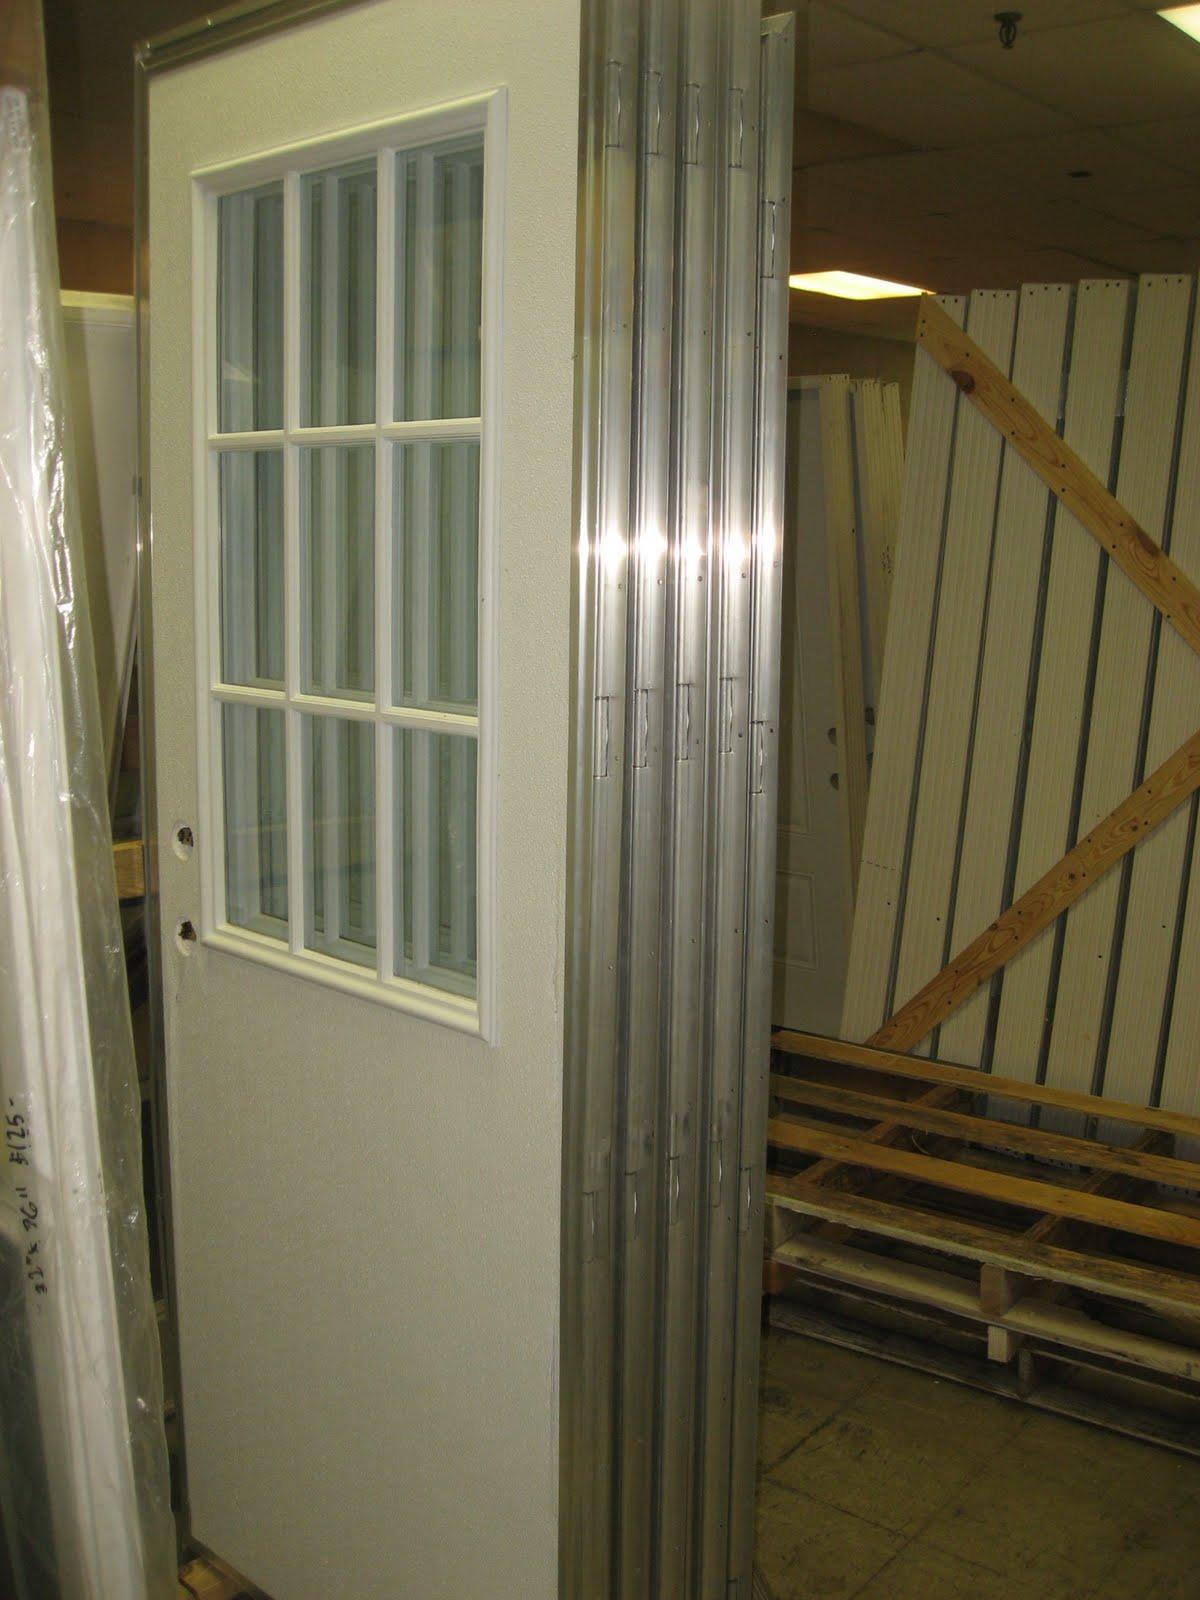 Blue Ridge Surplus: Mobile Home Doors, Windows, Ceiling Board